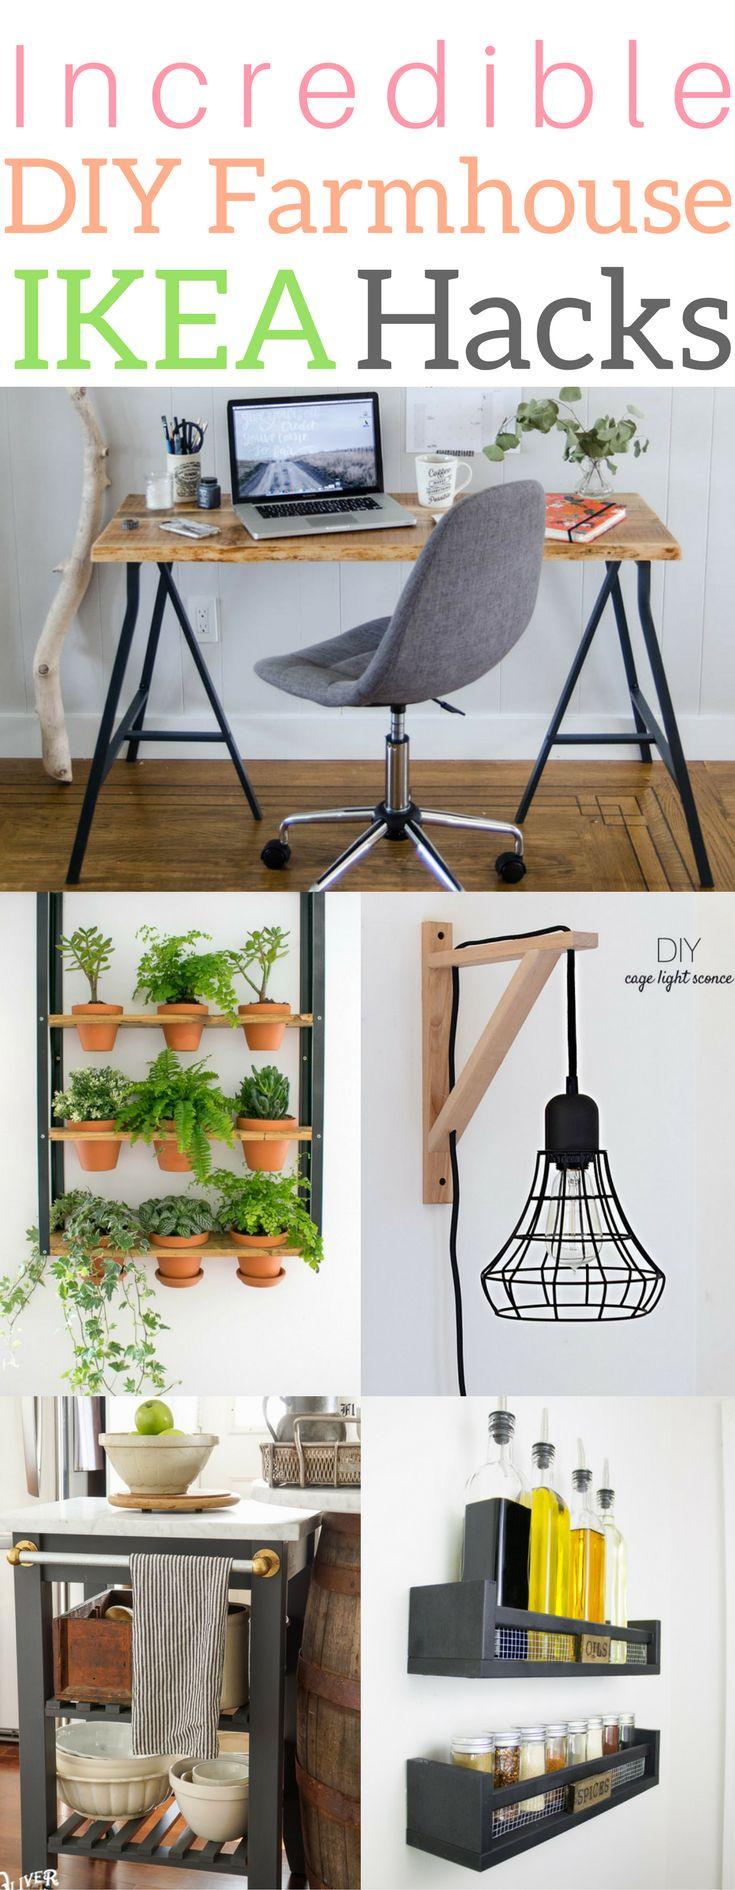 Incredible diy farmhouse IKEA hacks bedroom storage desk dresser lamp kitchen office nightstand DIY hacks